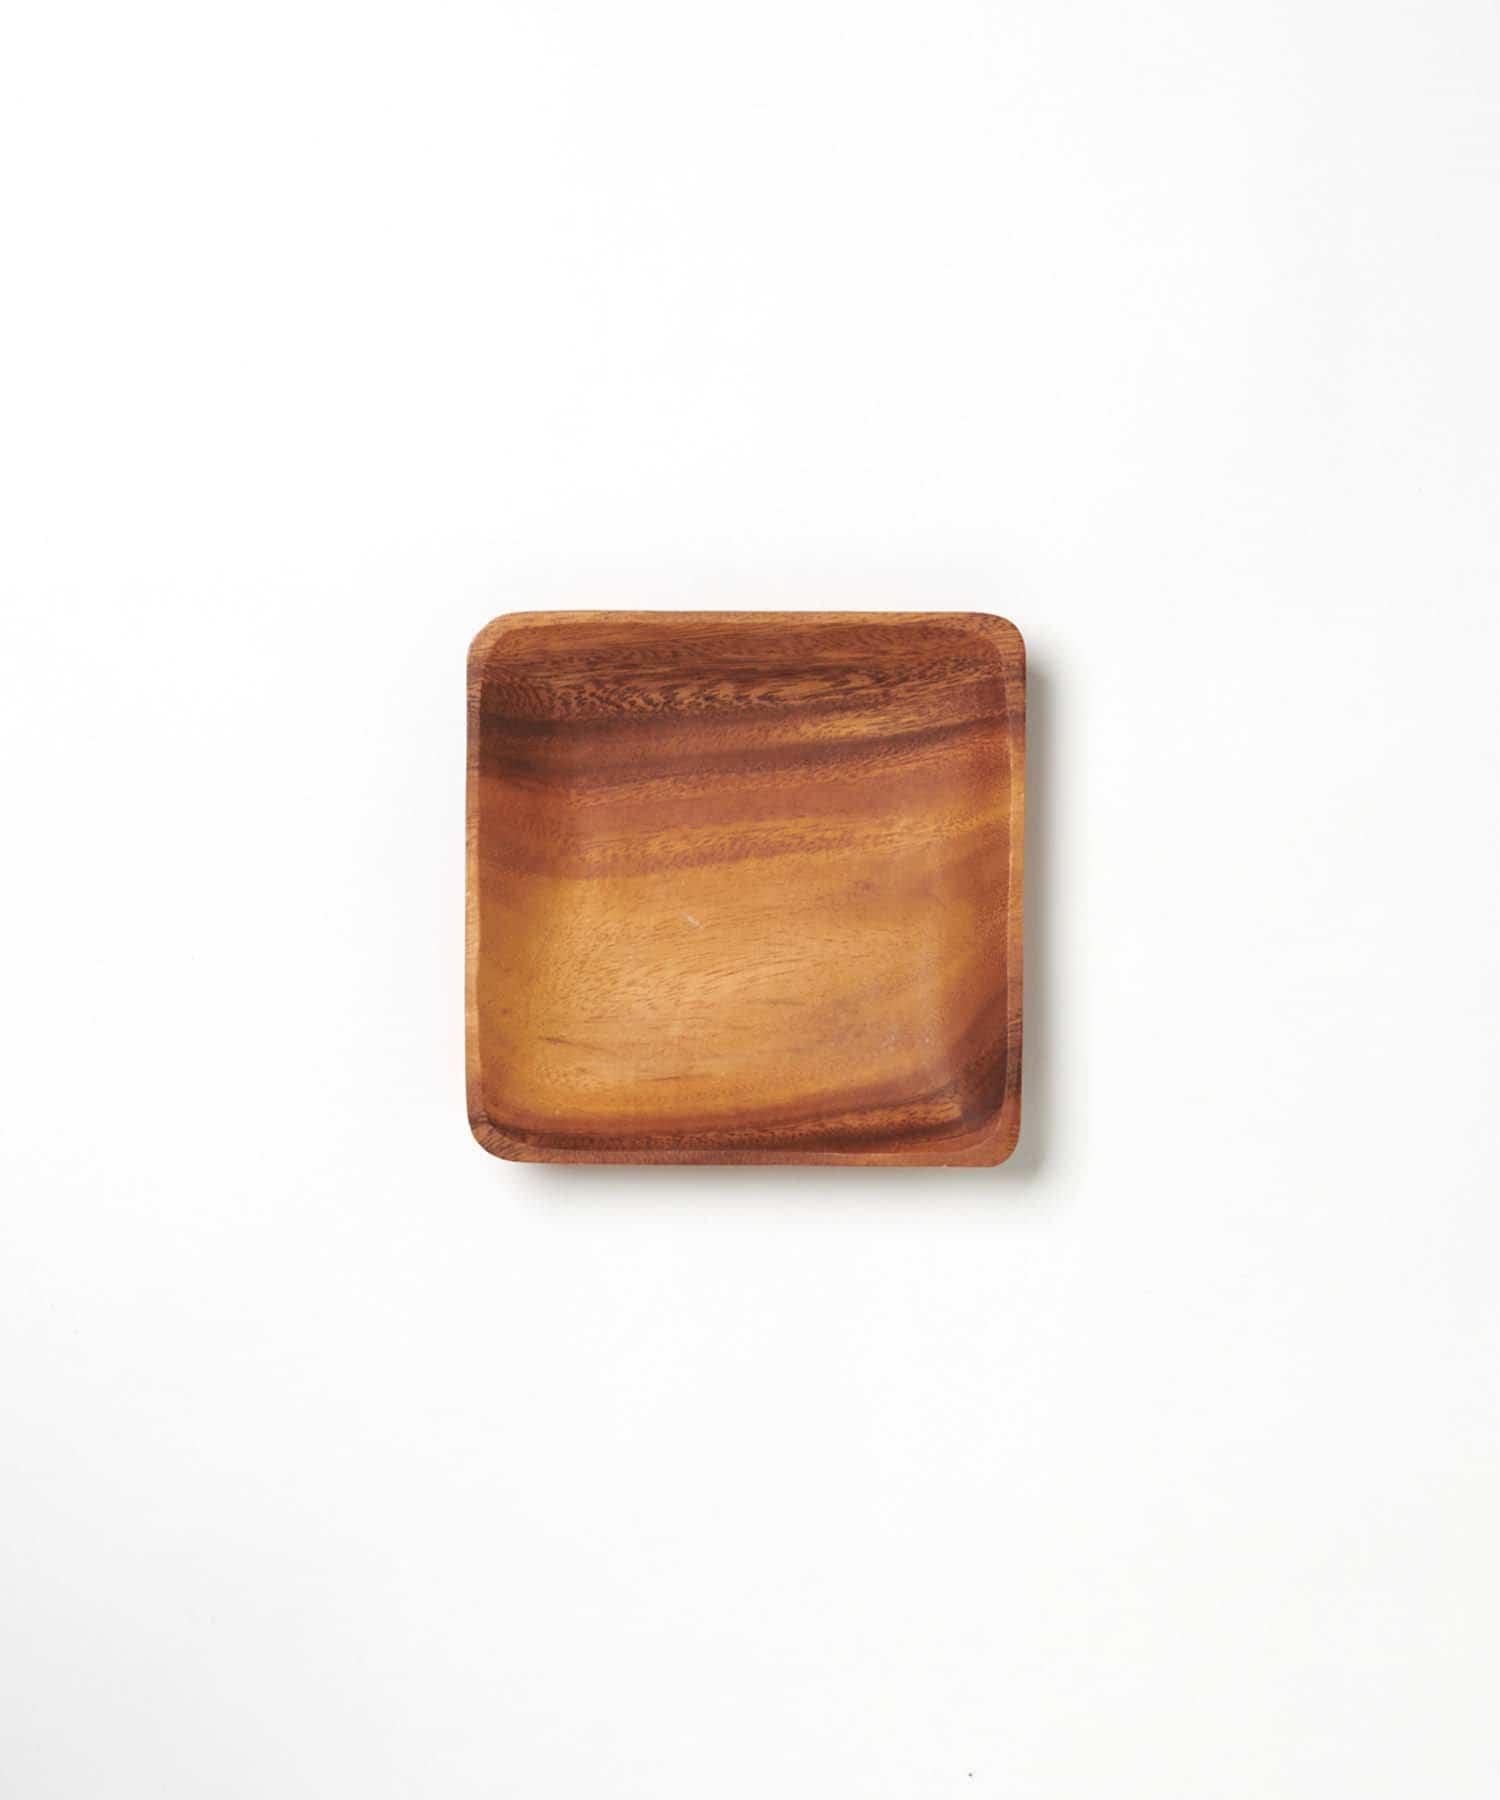 CIAOPANIC TYPY(チャオパニックティピー) ライフスタイル 〈木製食器・お皿〉アカシアスクエアトレー M ブラウン